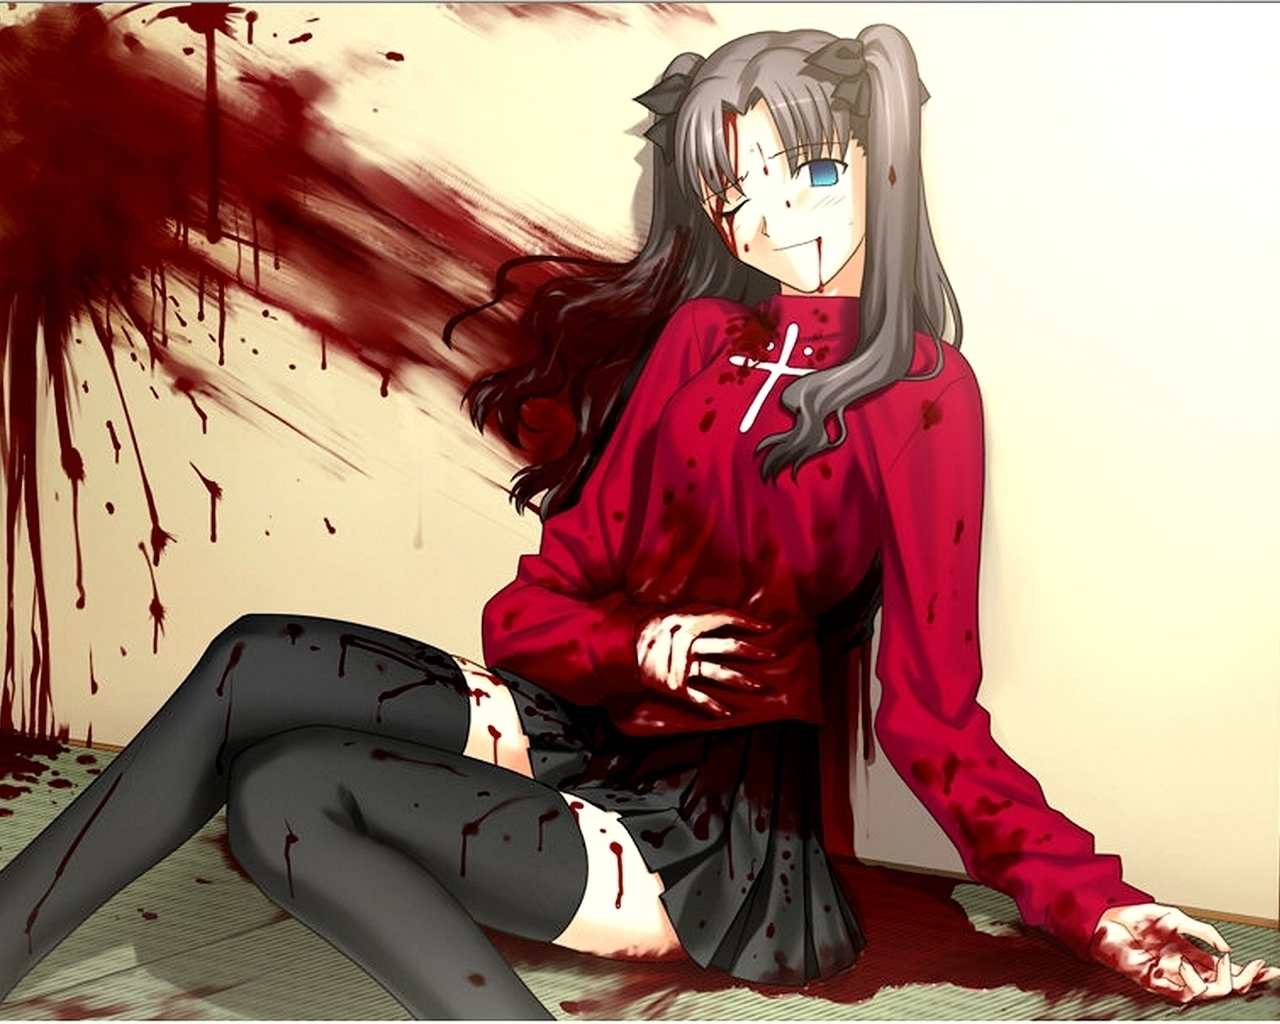 Жестокие аниме картинки 1 фотография